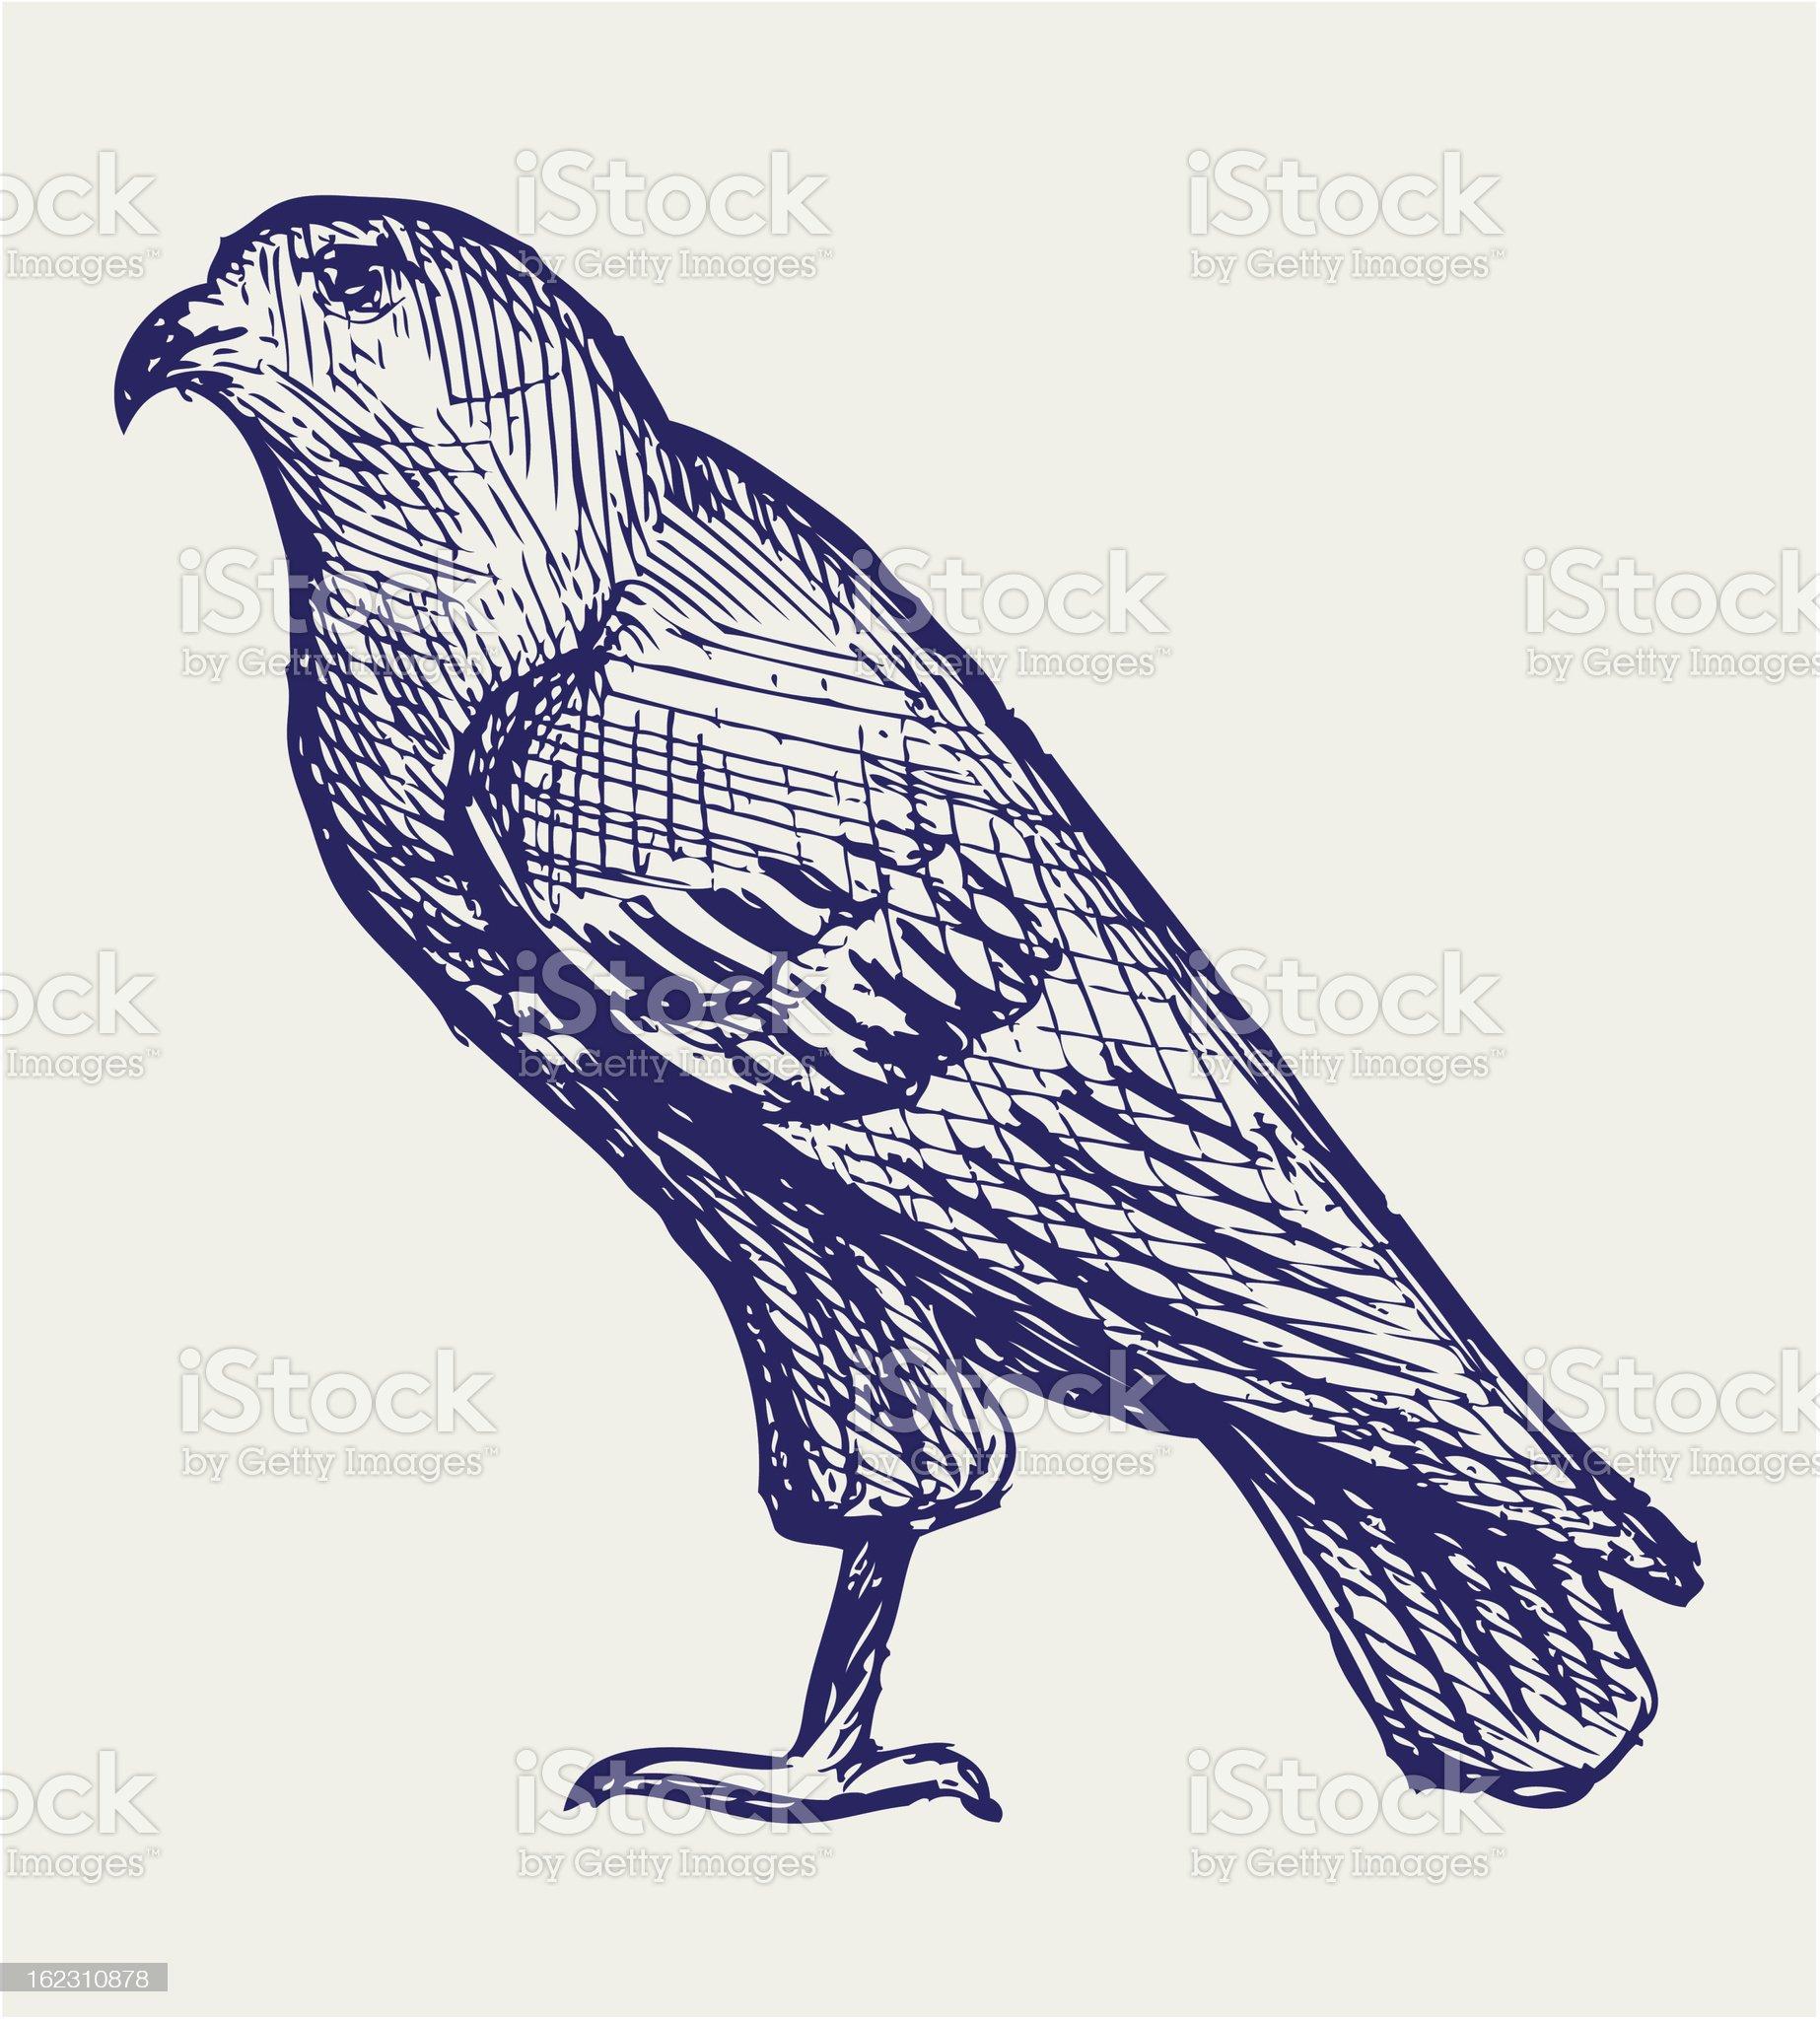 Hawk royalty-free stock vector art